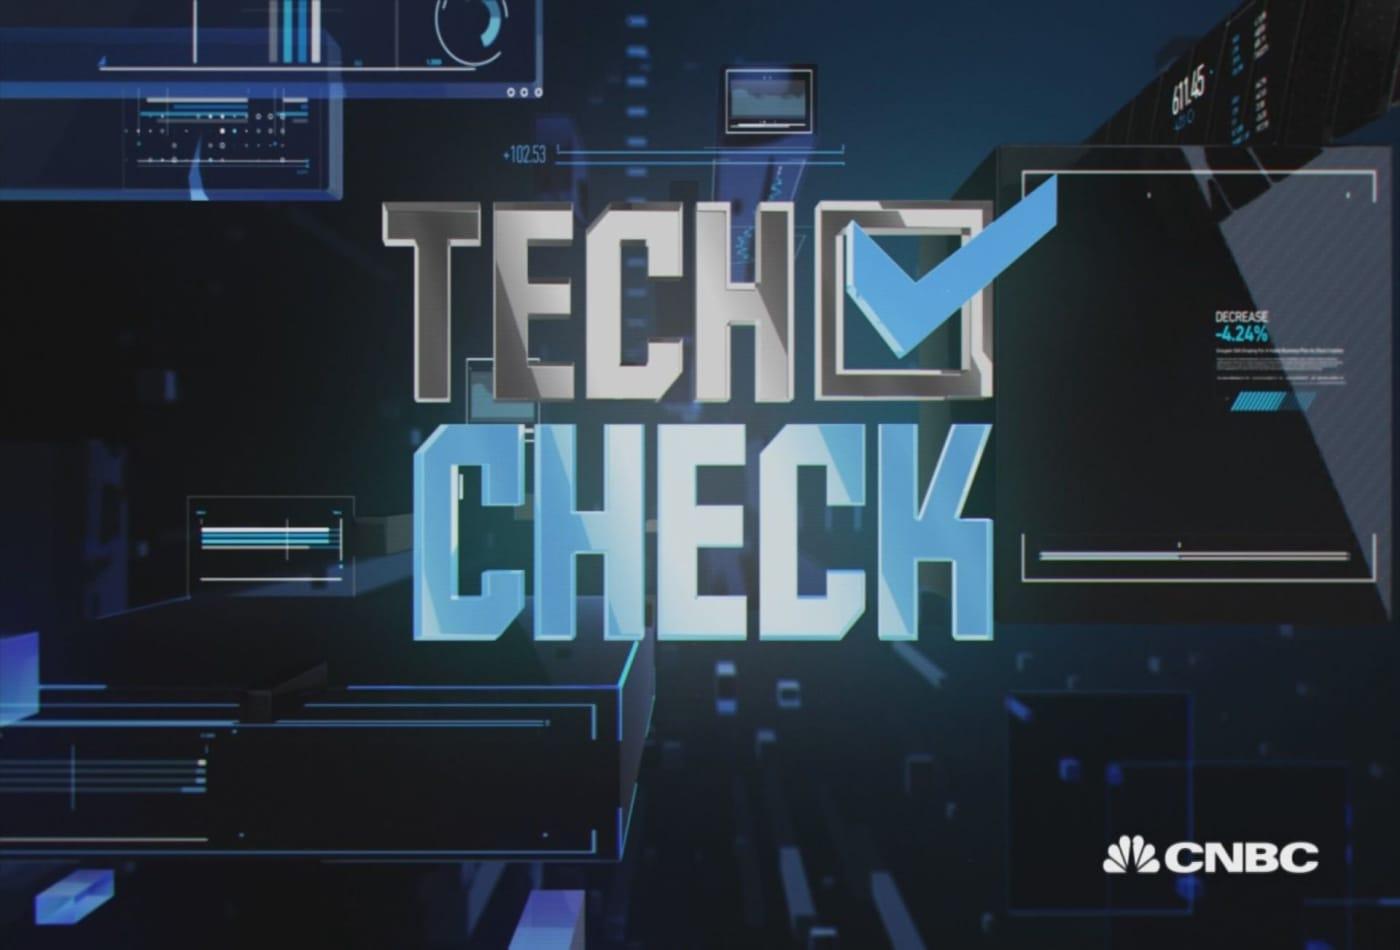 CNBC Tech Check Evening Edition: December 26, 2019